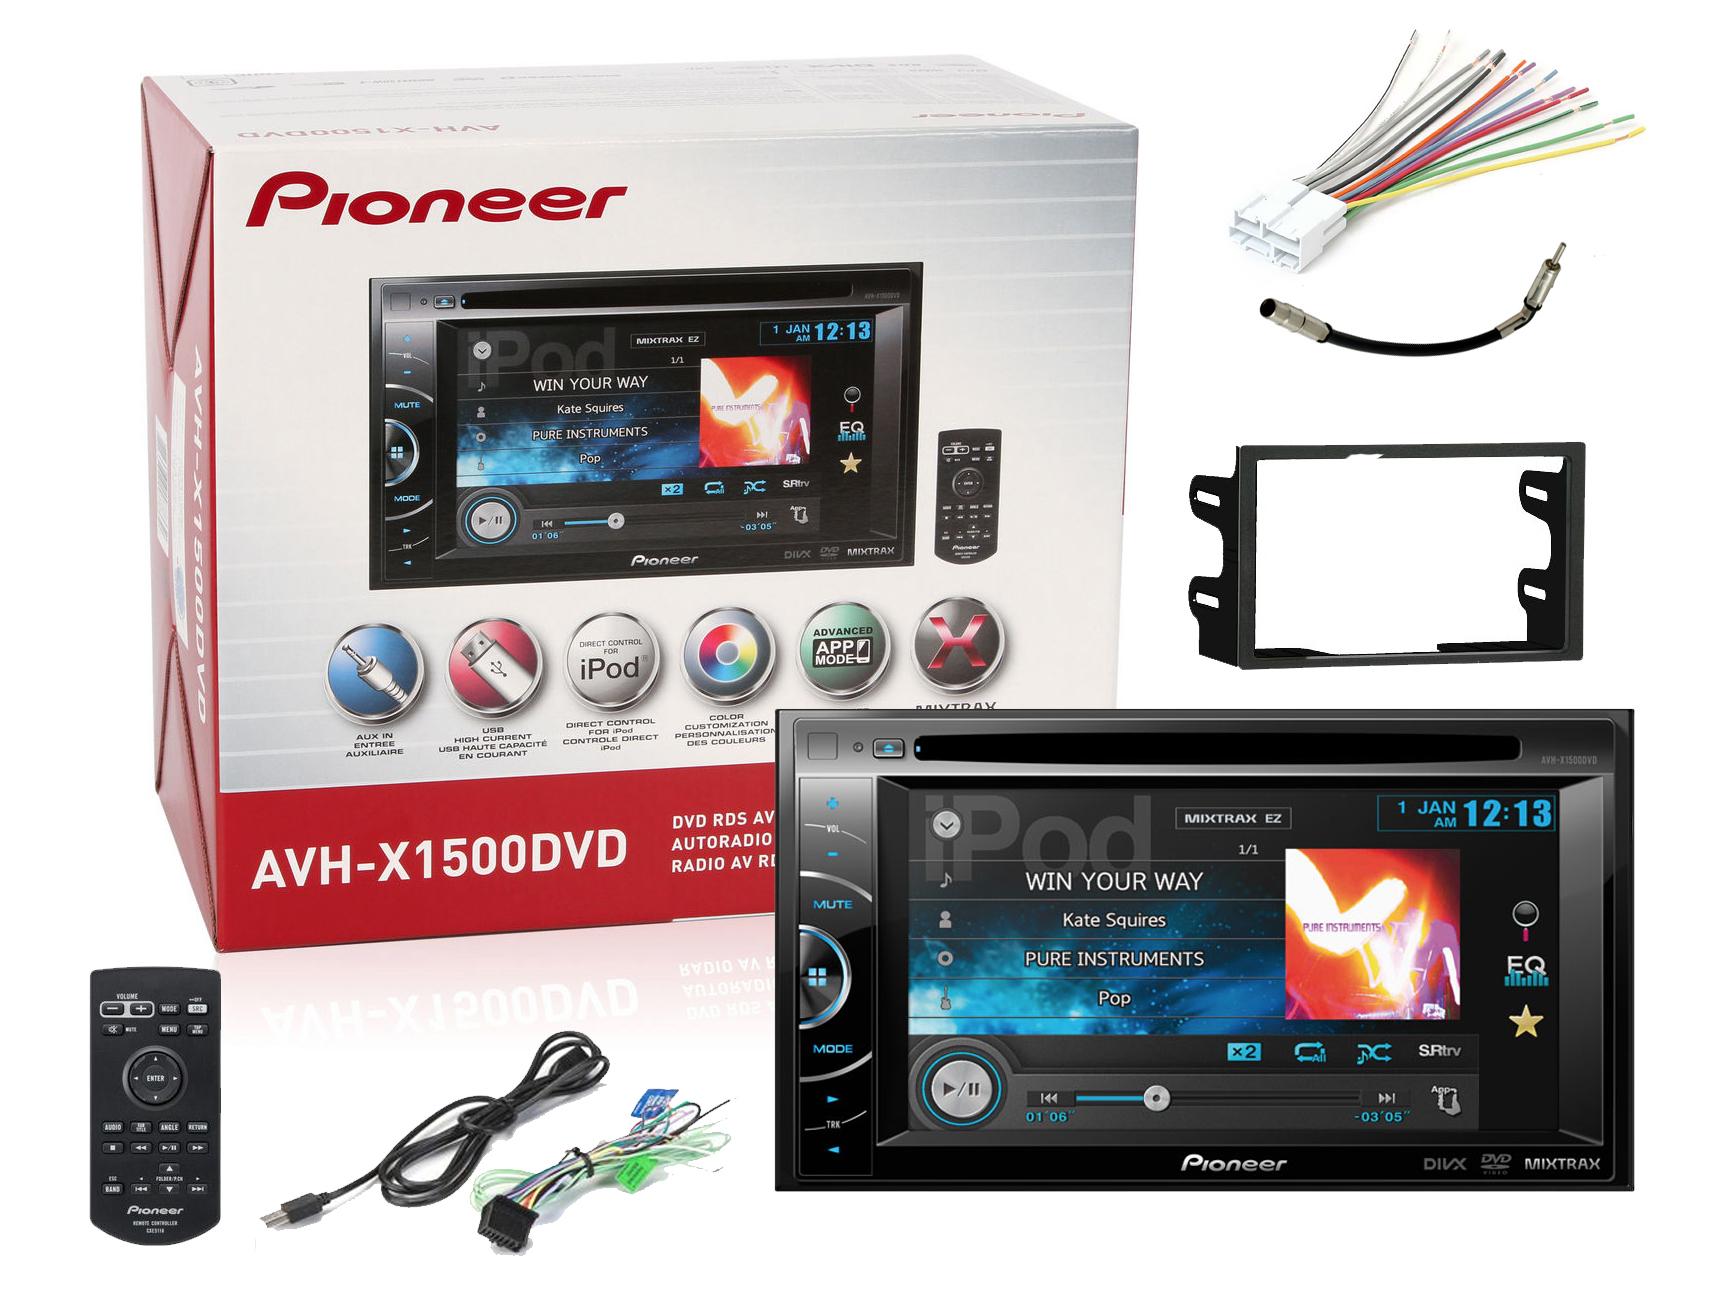 Pioneer Avh X1500dvd 6 1 034 Monitor Car Dvd Receiver New